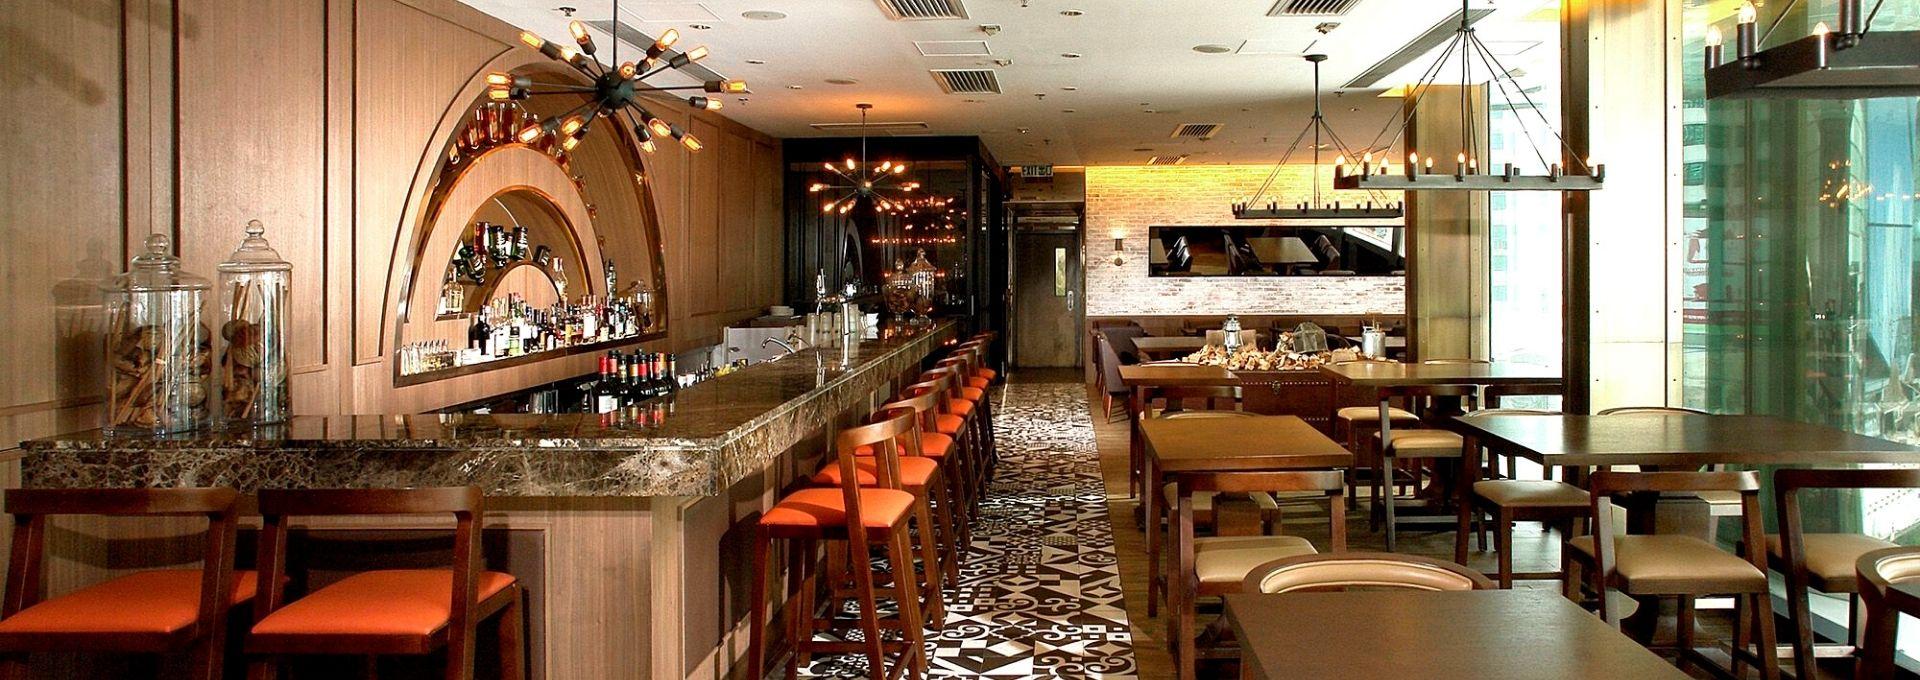 Meet the 5 Best Interior Designers In Macau